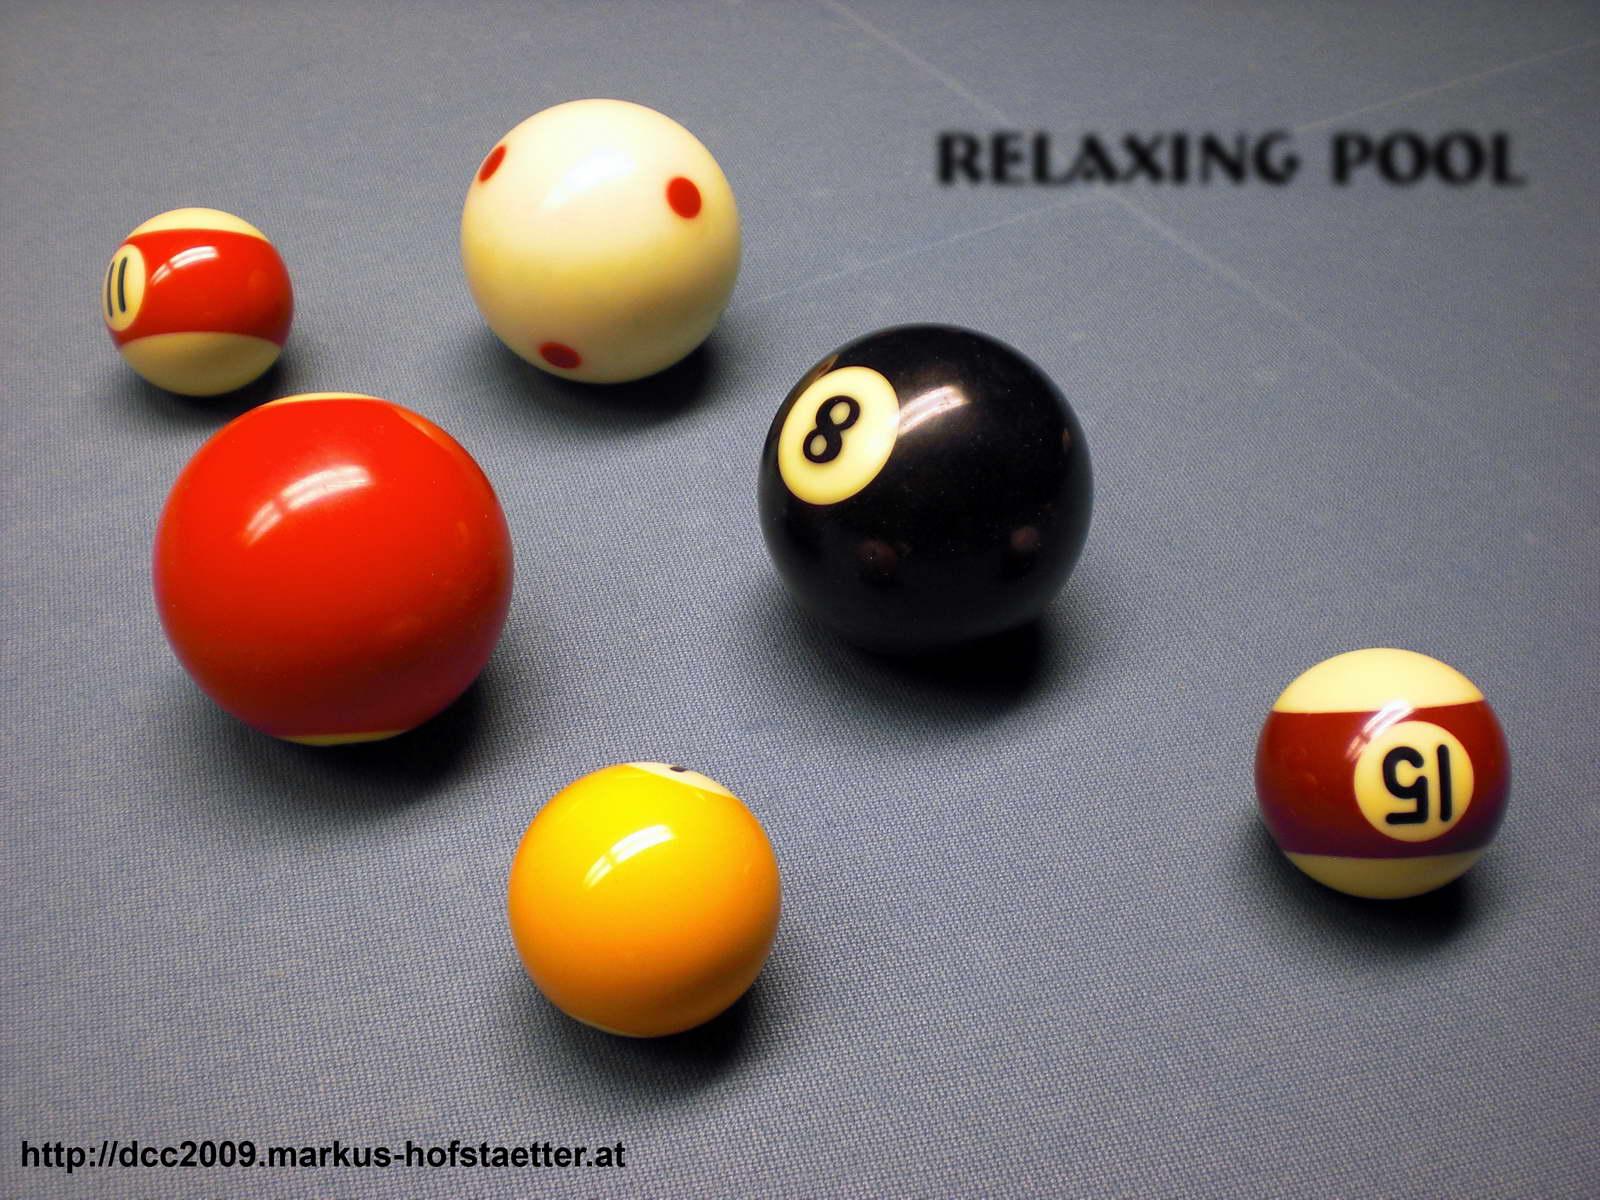 Relaxing Pool 6